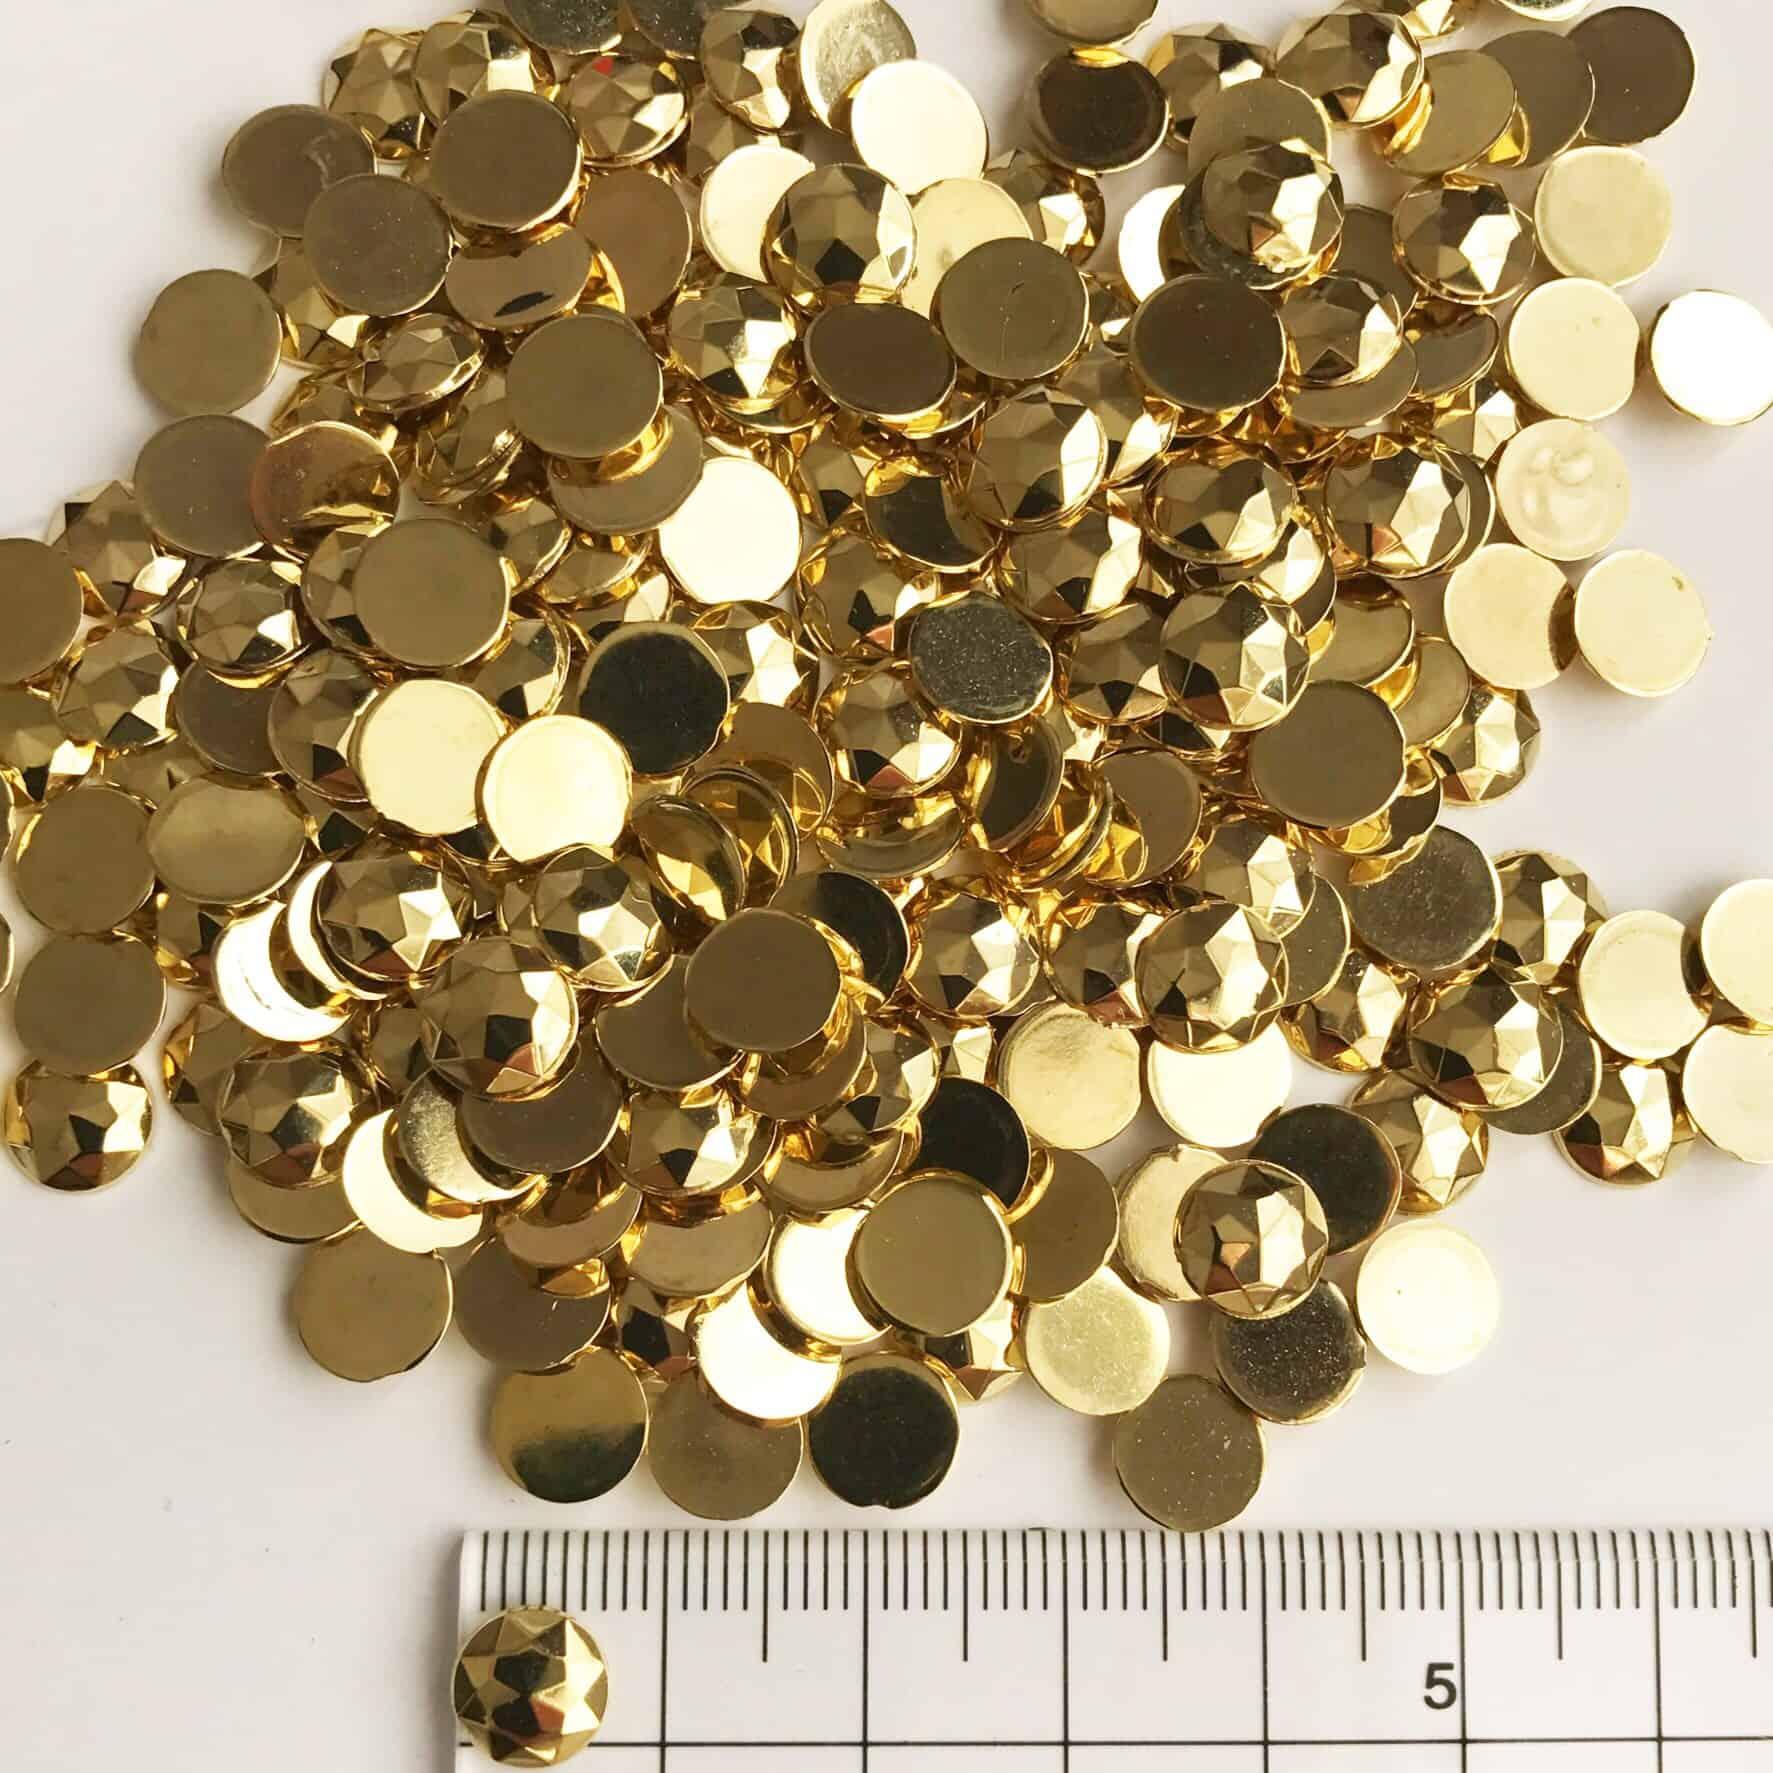 8mm Round Metallic Gold Acrylic Gem Stones (Pack of 1000)